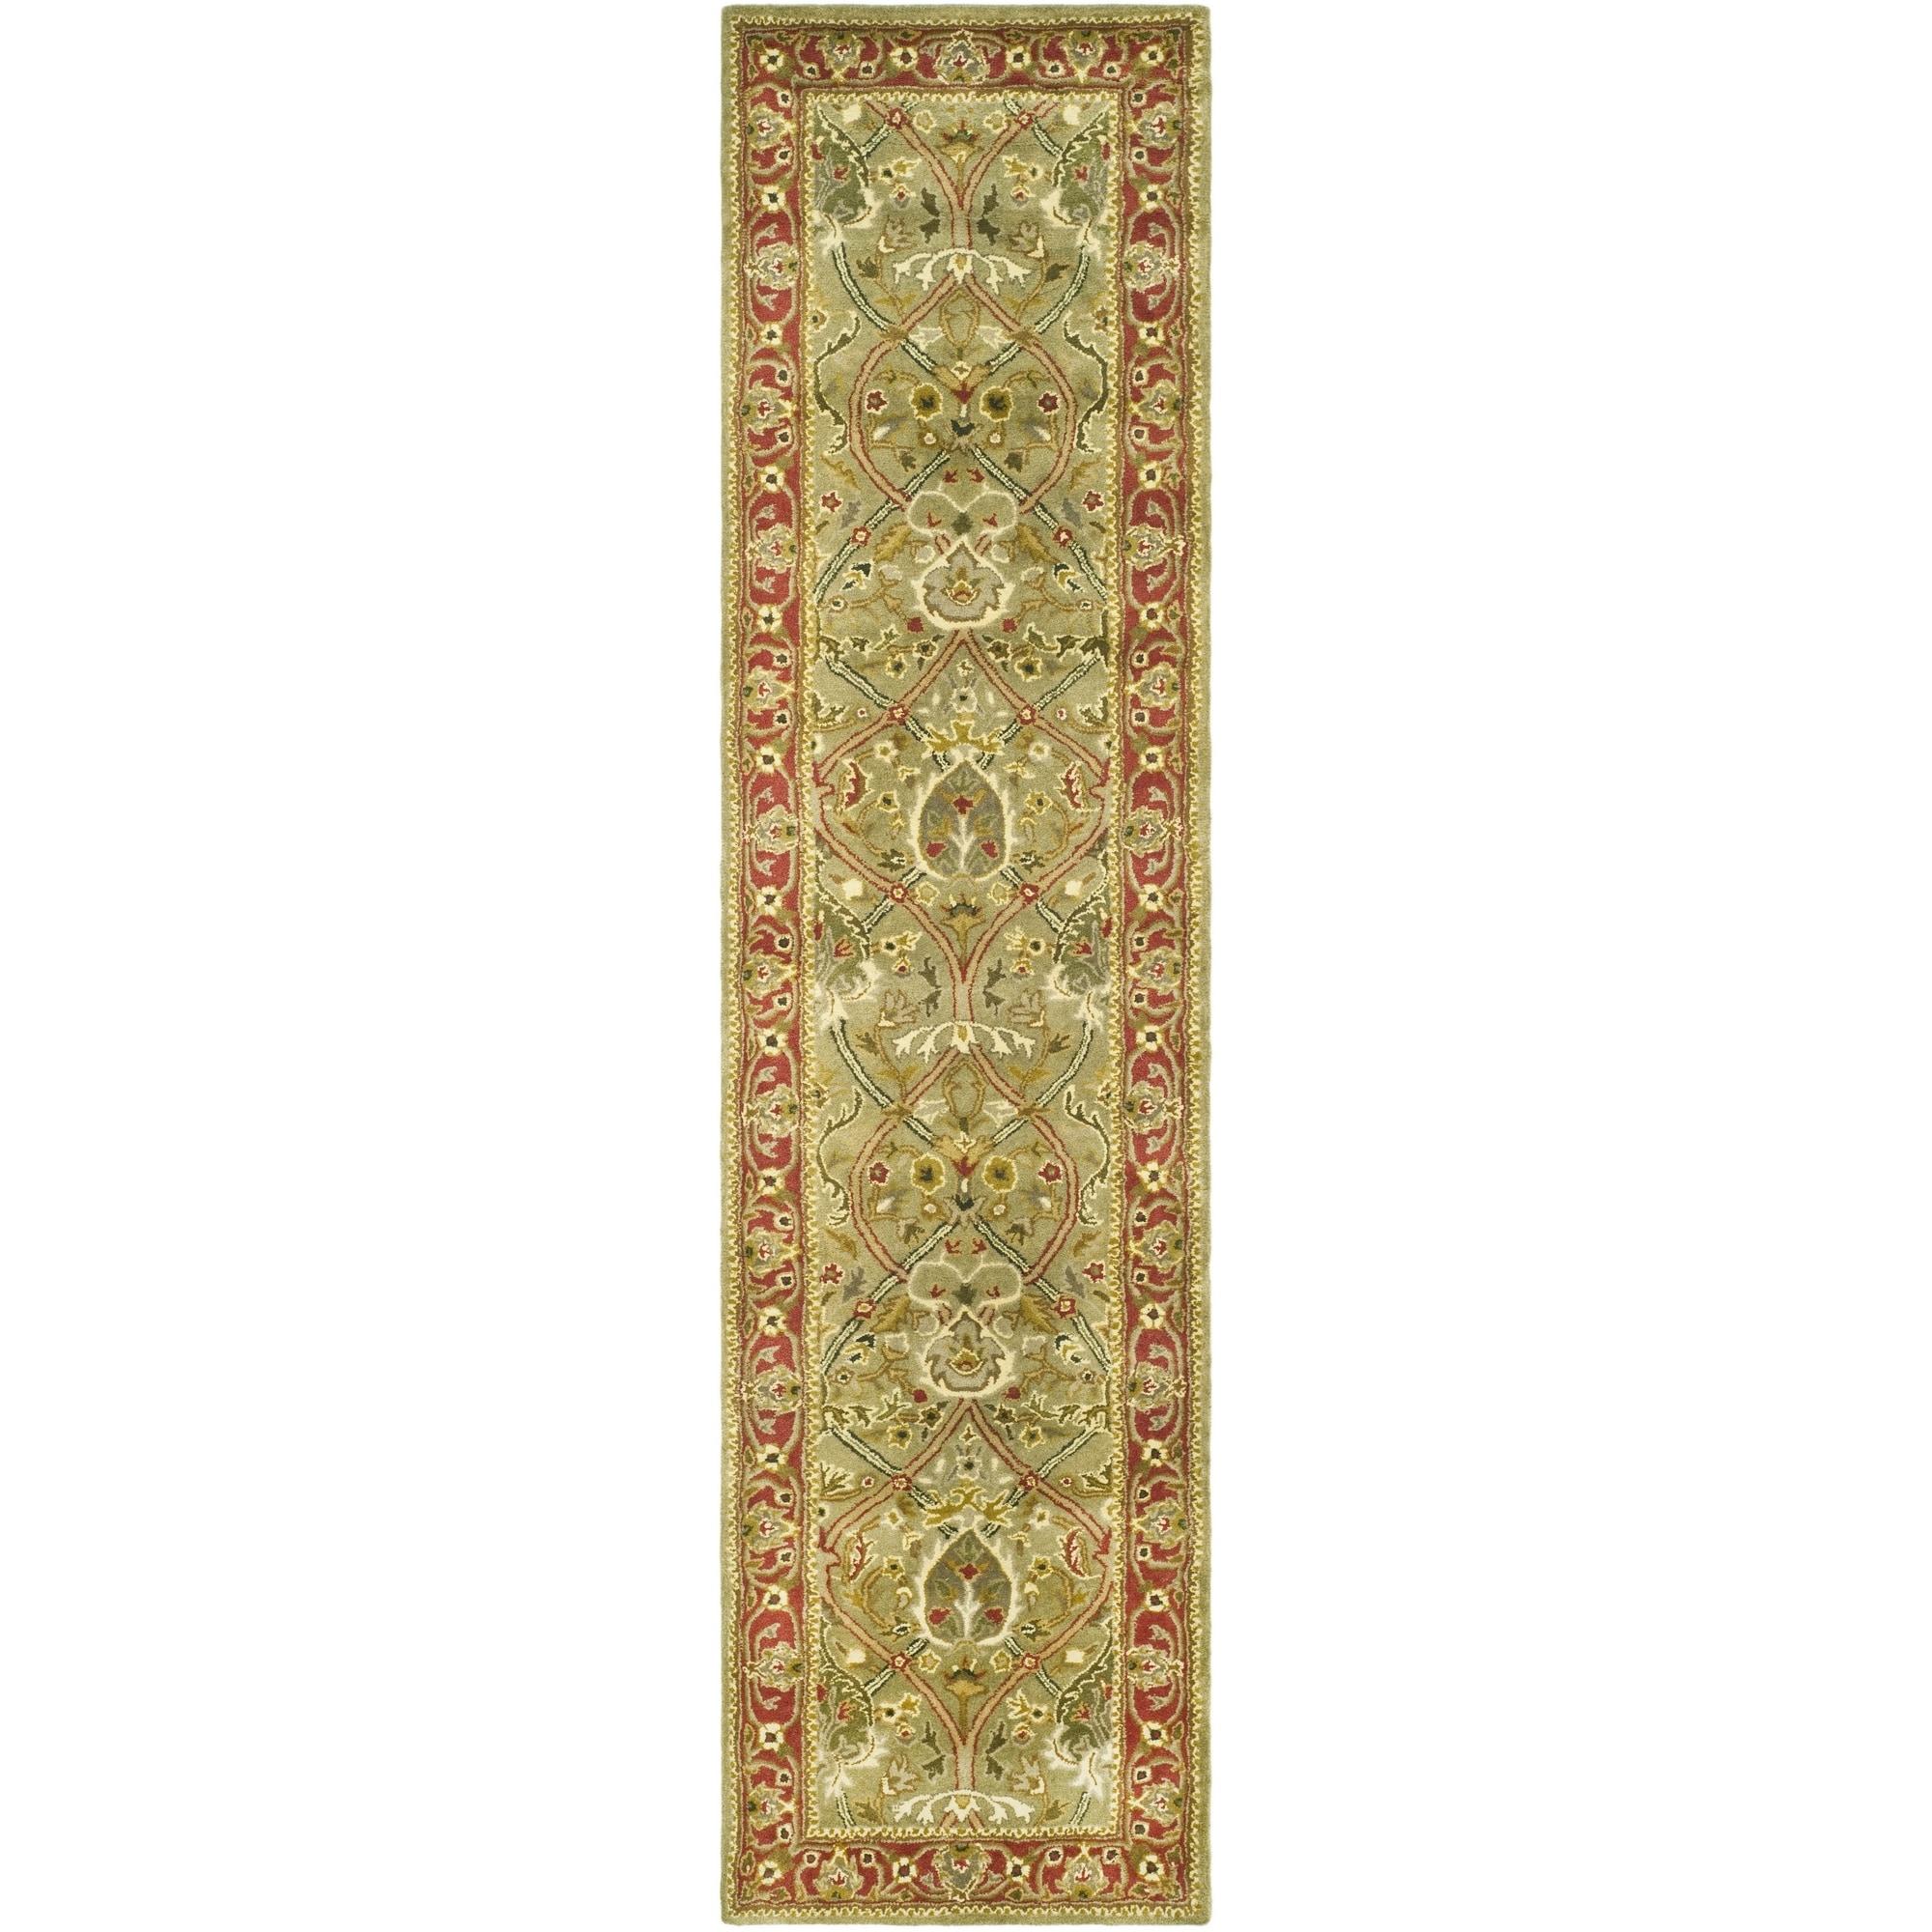 Safavieh Handmade Persian Legend Light Green/ Rust Wool Rug (2'6 x 18')